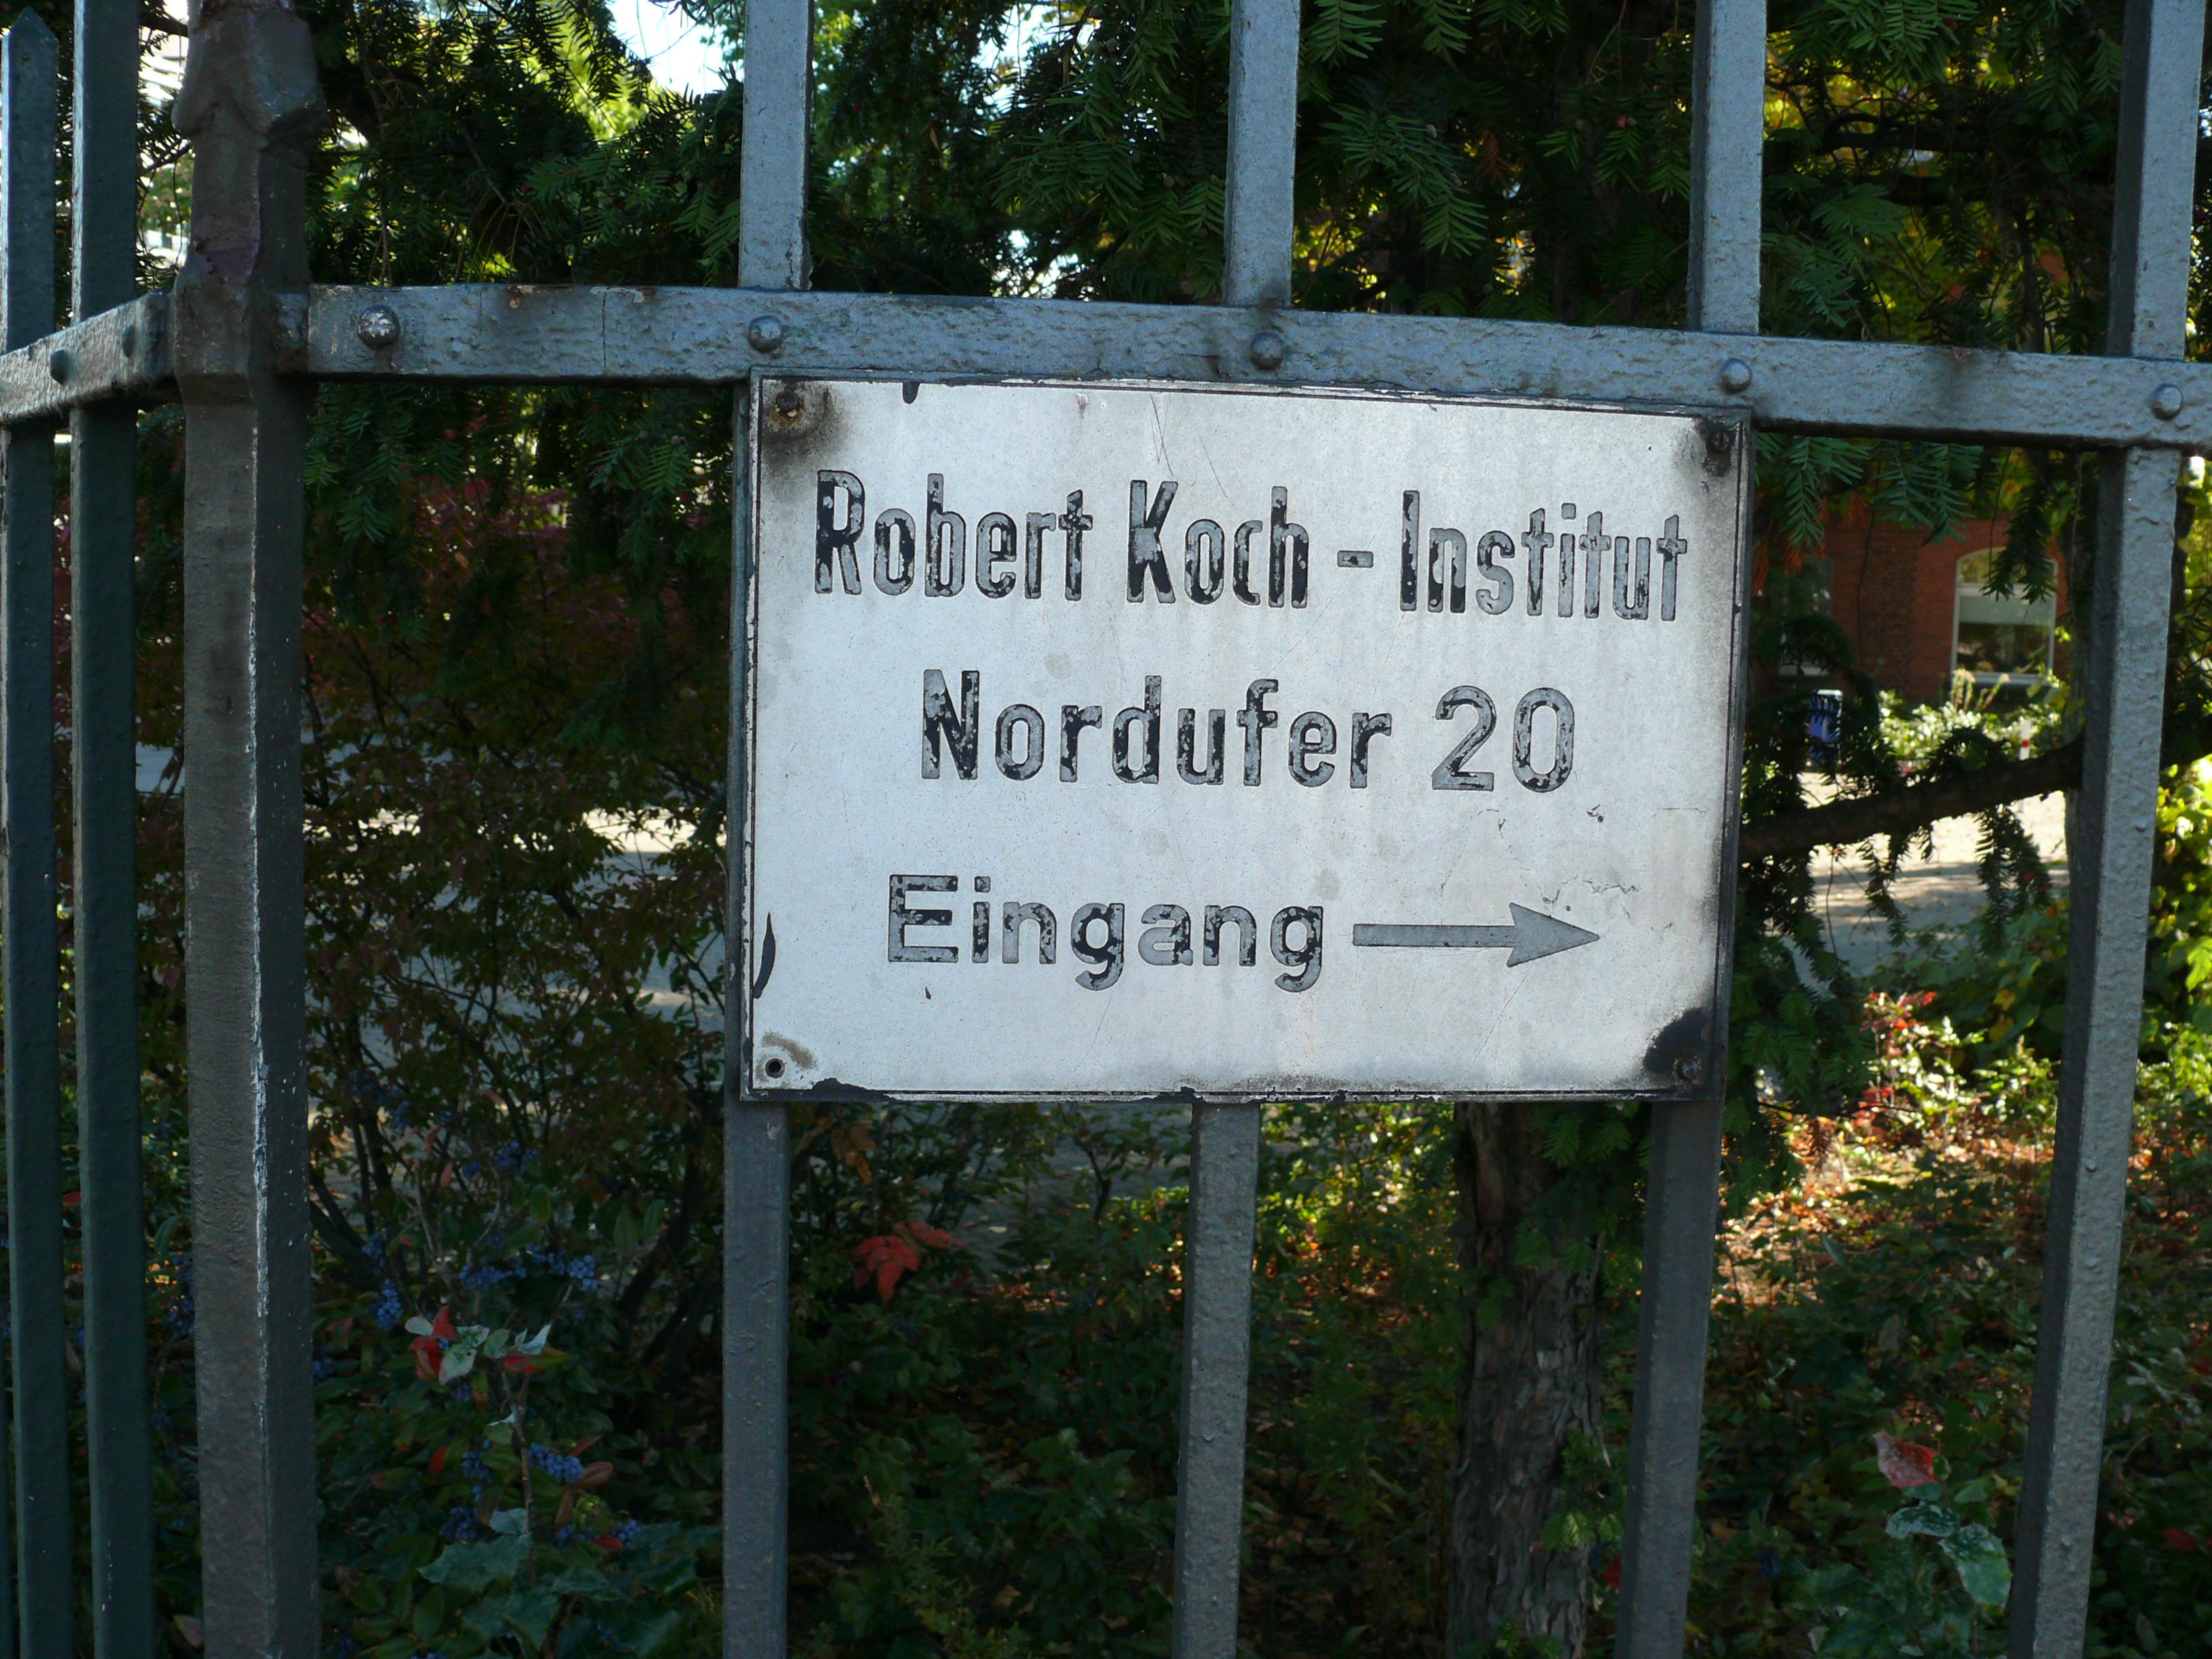 File:Wedding Nordufer RKI Zaun-002.jpg - Wikimedia Commons